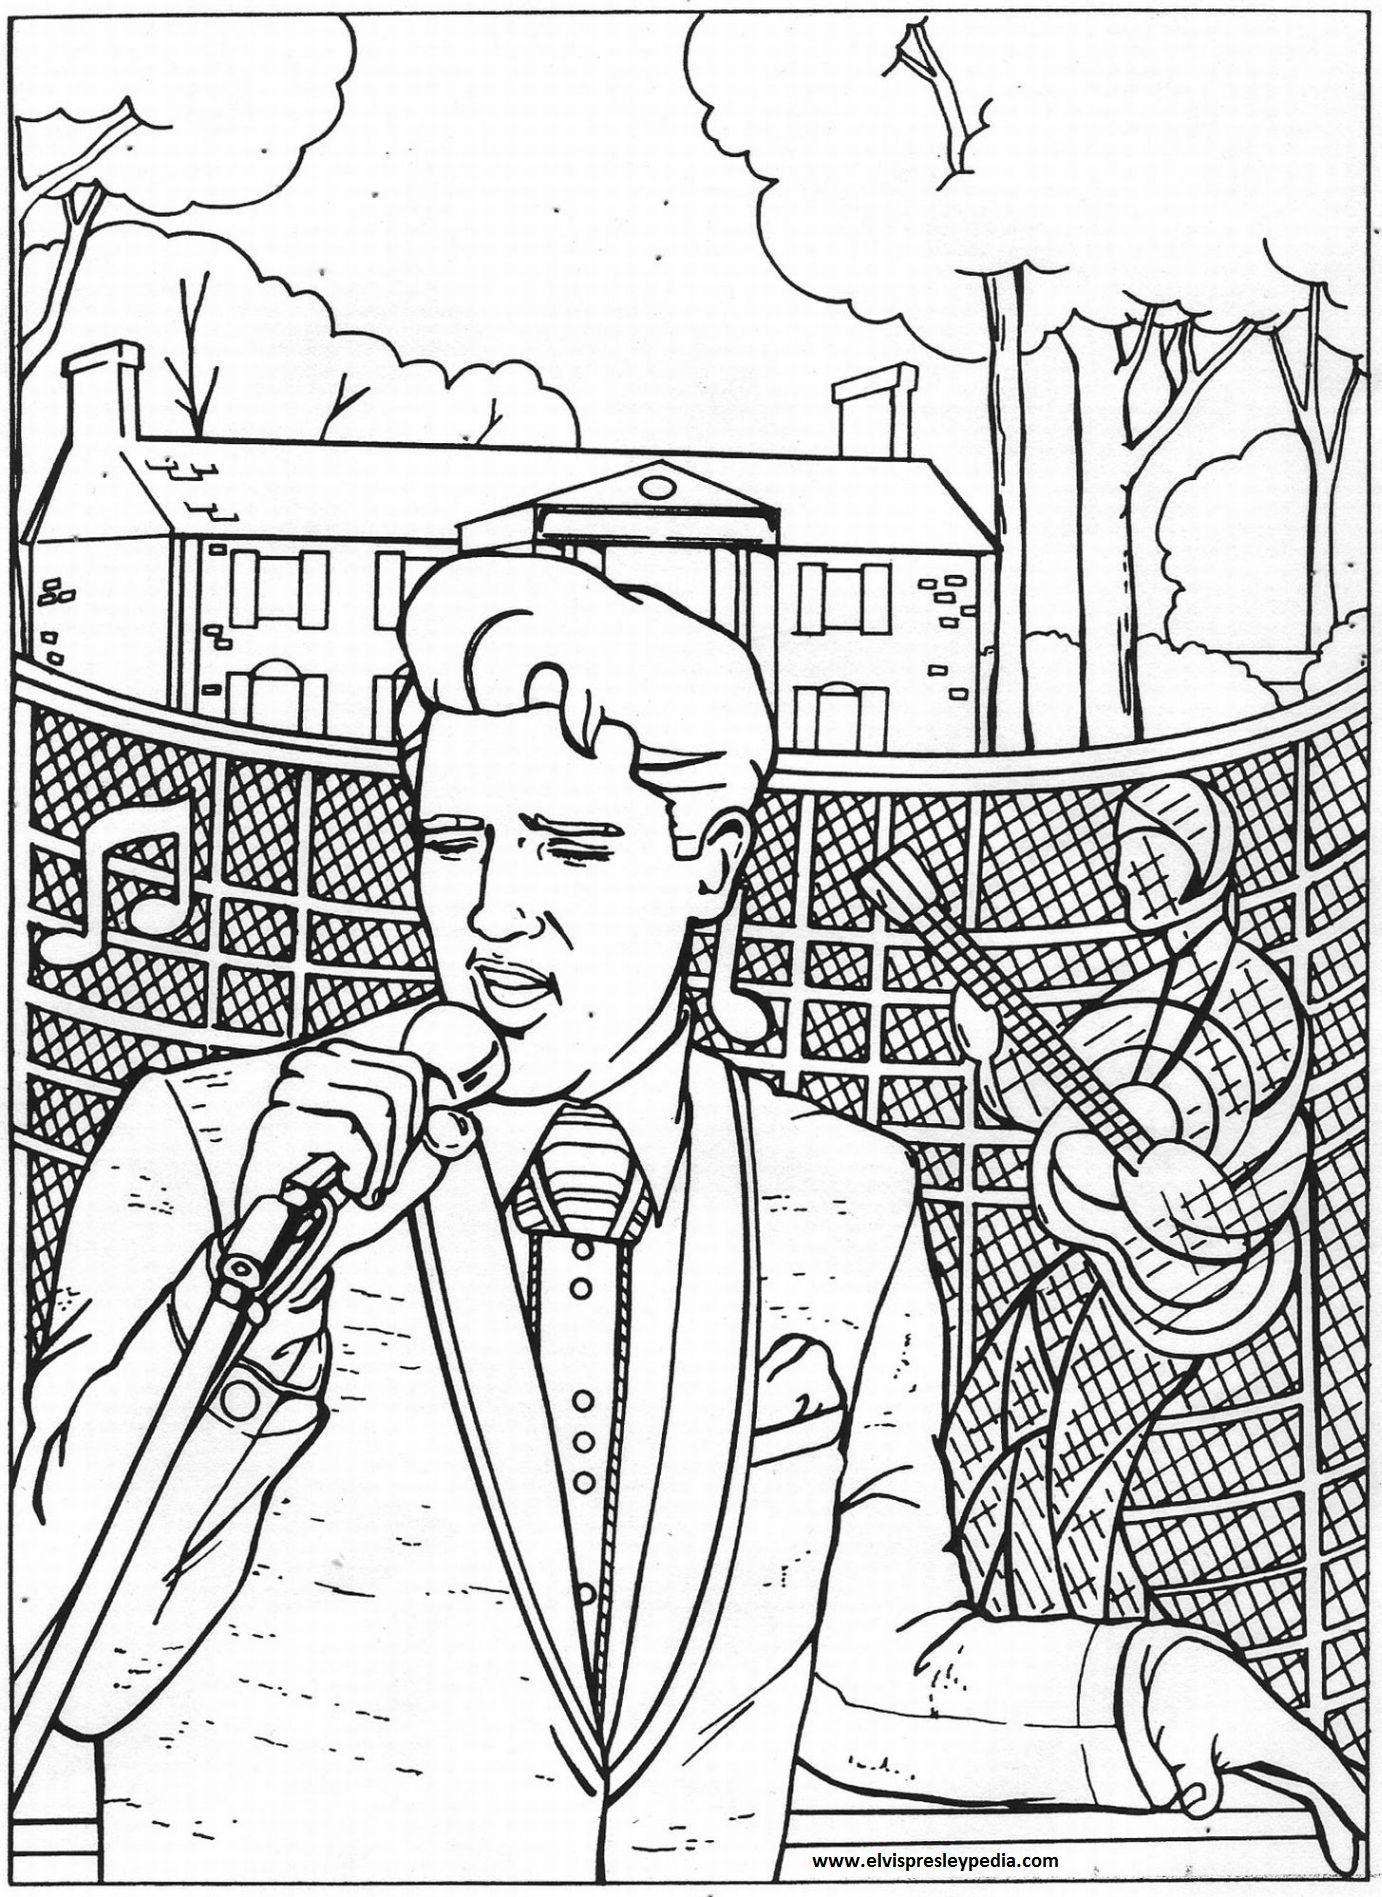 Elvis Presley Coloring Pages : elvis, presley, coloring, pages, Elvis, Presley, Coloring, Pages, Pages,, Books